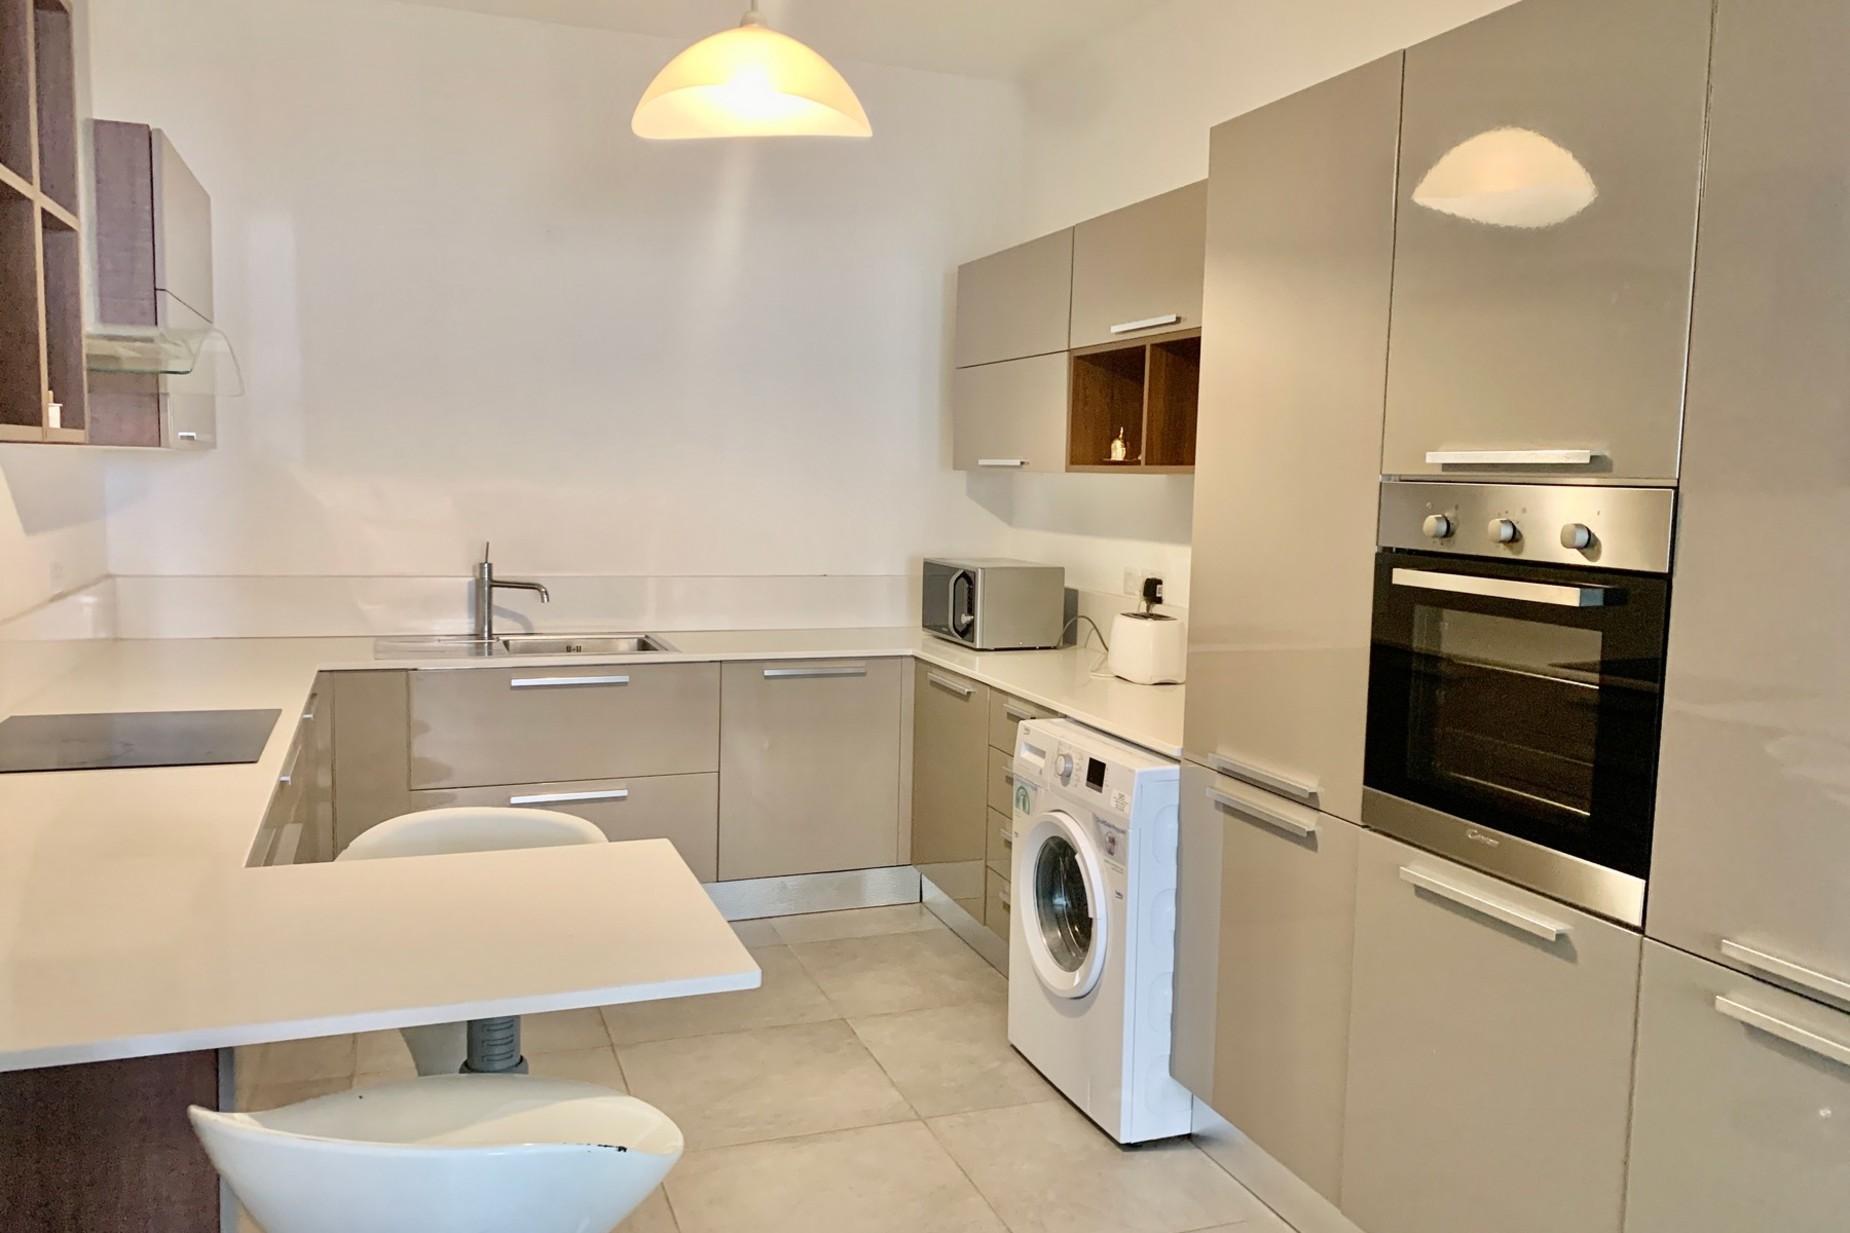 2 bed Apartment For Rent in Sliema, Sliema - thumb 10